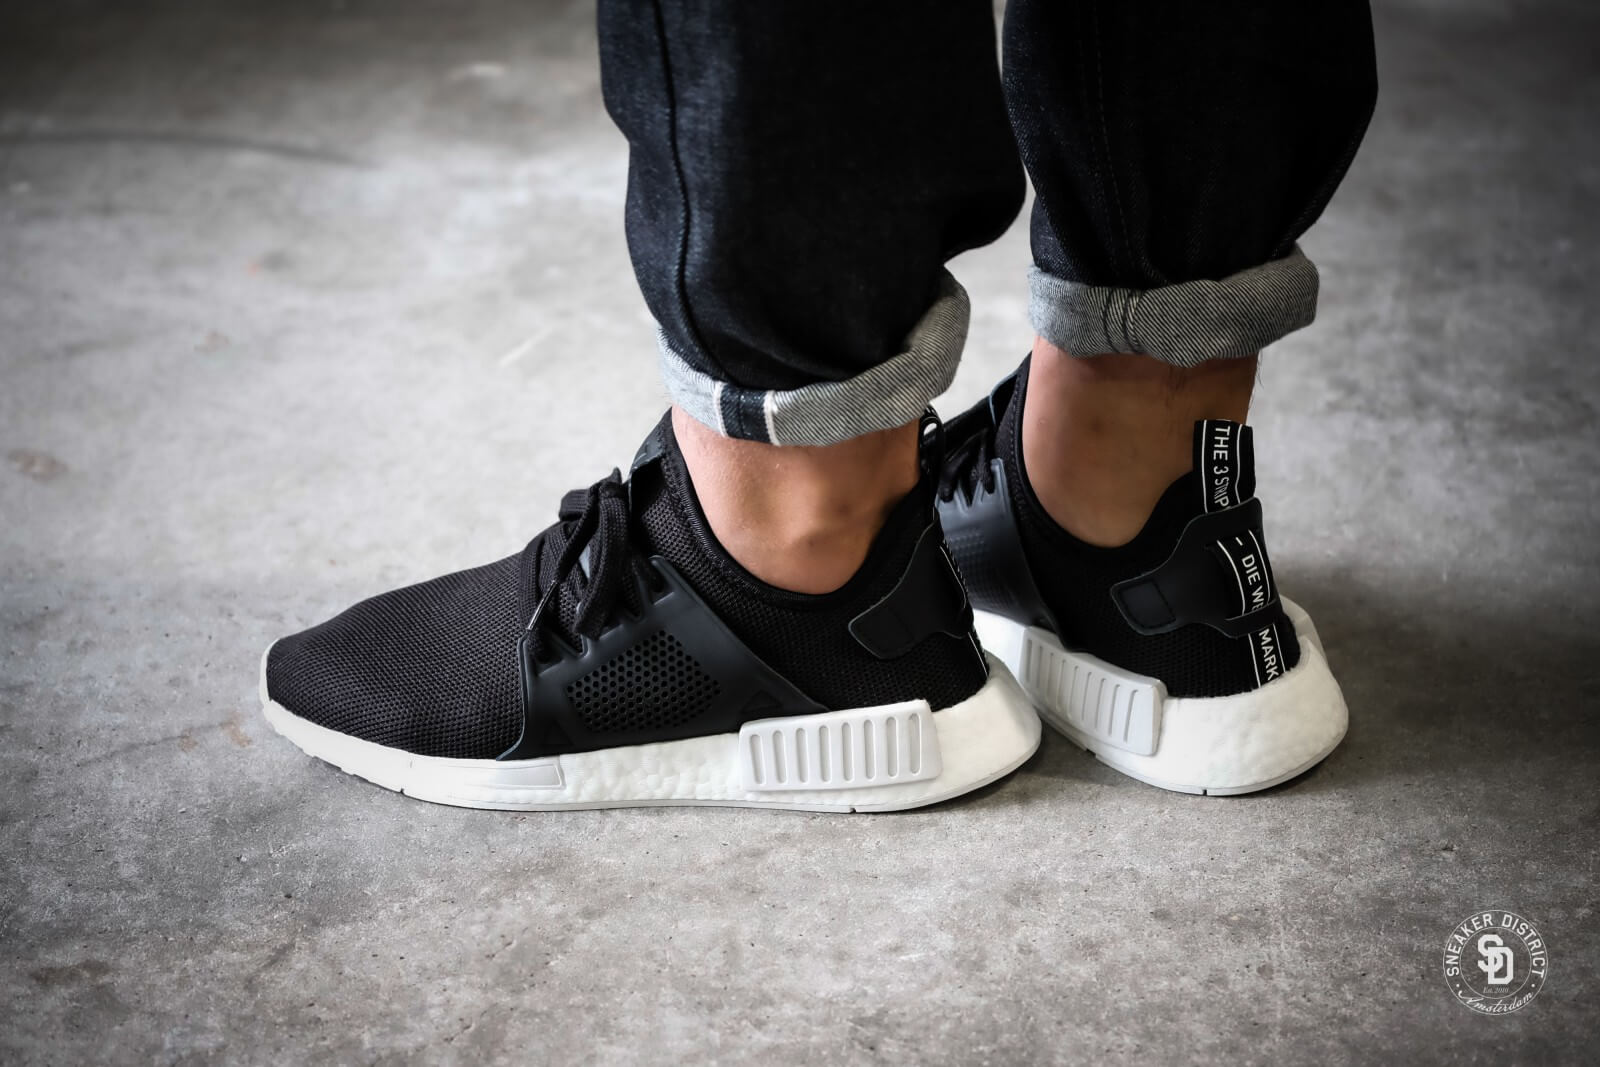 Adidas Nmd Xr1 Core Black Footwear White By9921